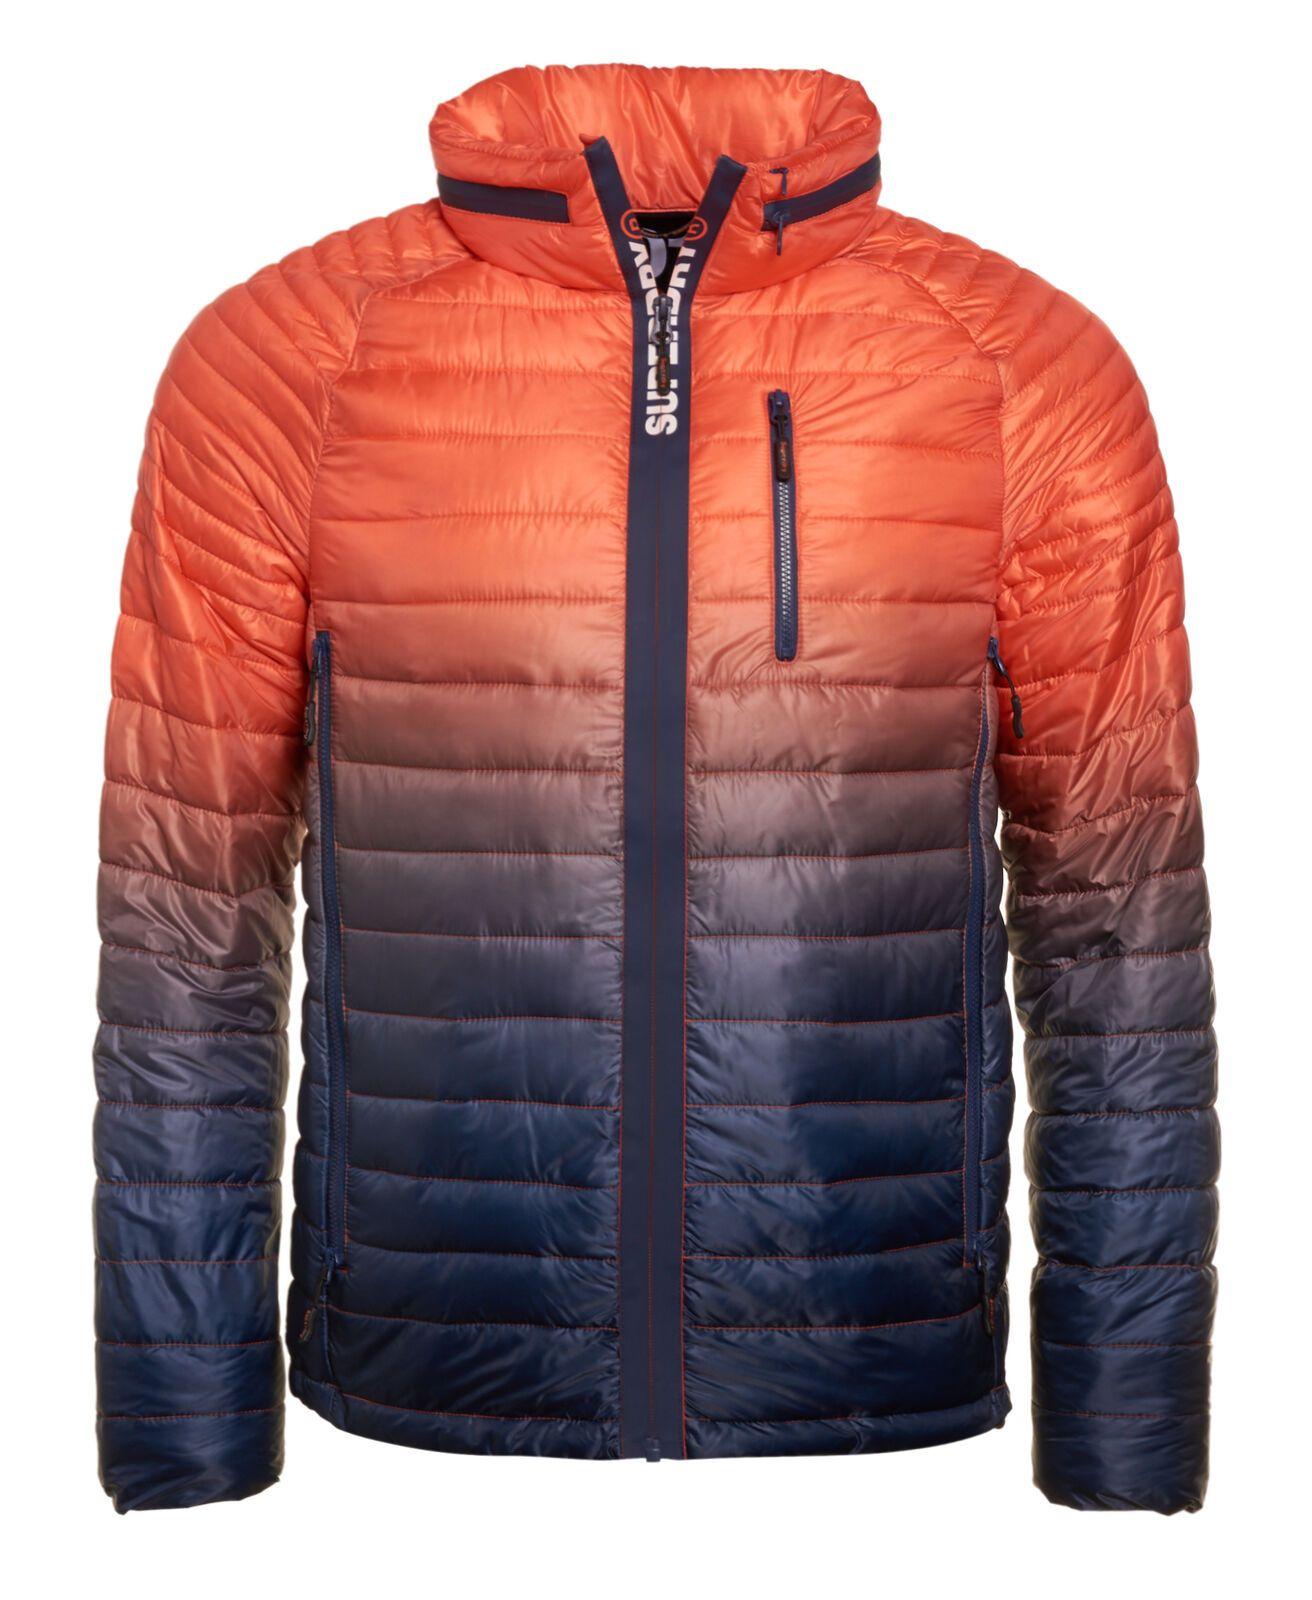 Details About New Mens Superdry Mens Power Fade Jacket Ink Orange Superdry Jackets Track Suit Men Jackets